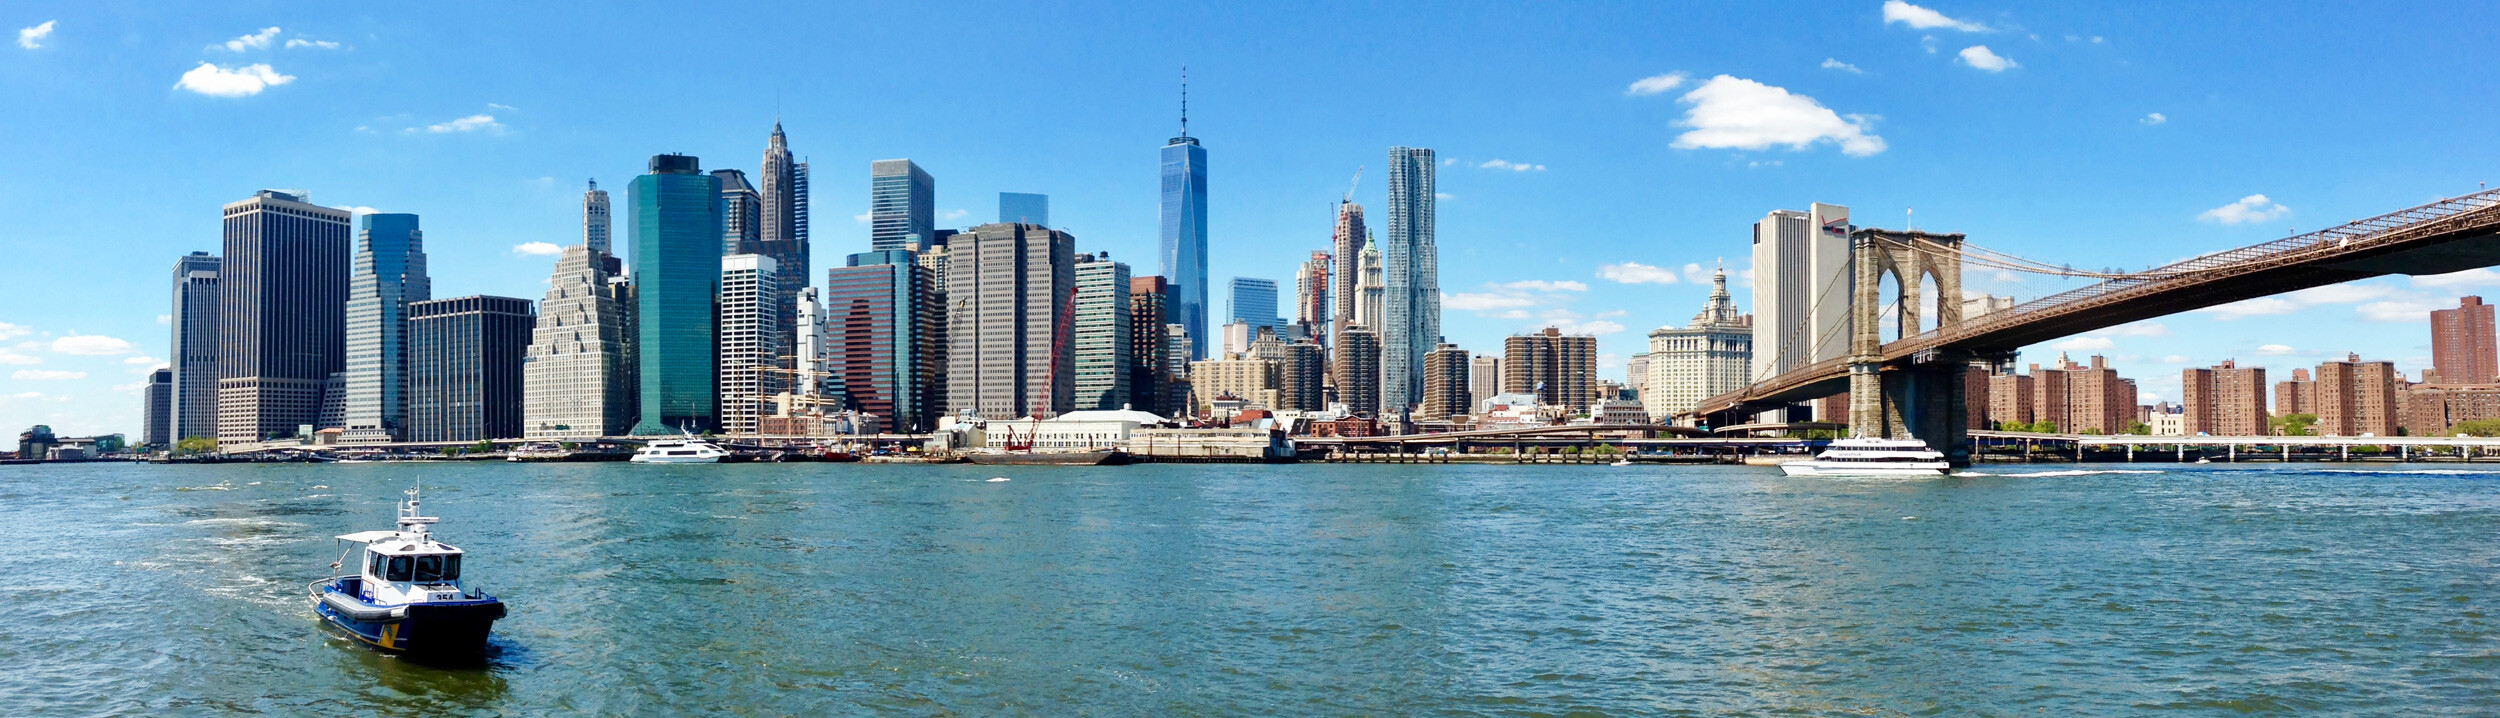 Reisebericht New York City - Brooklyn Heights